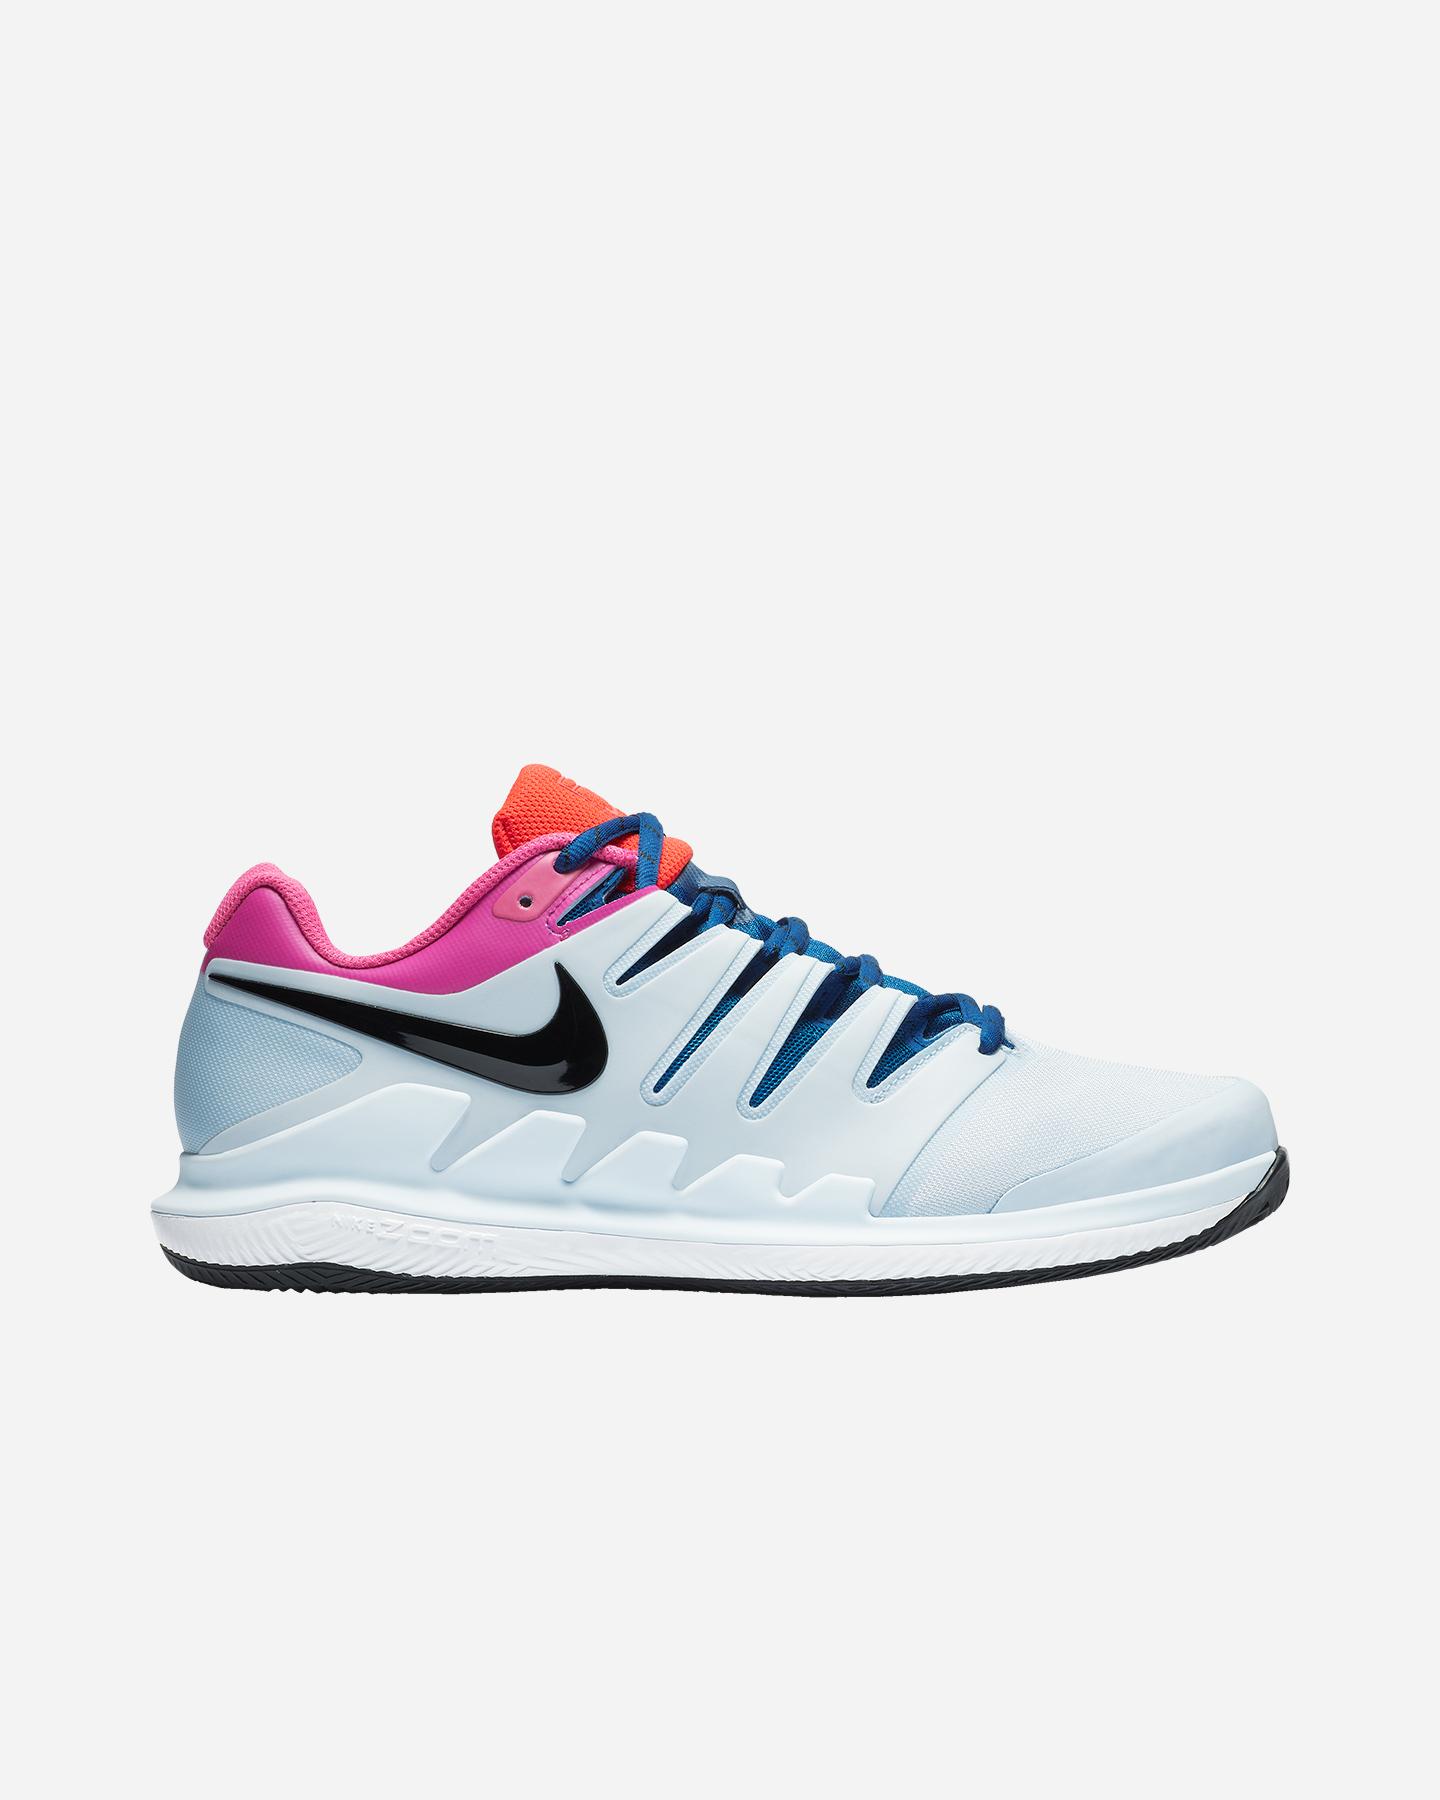 Aa8021 Tennis Vapor Scarpe M X Cisalfa Zoom Nike Su 401 Sport Clay Air  Hwn6SYnxza ae3dcfb6c07